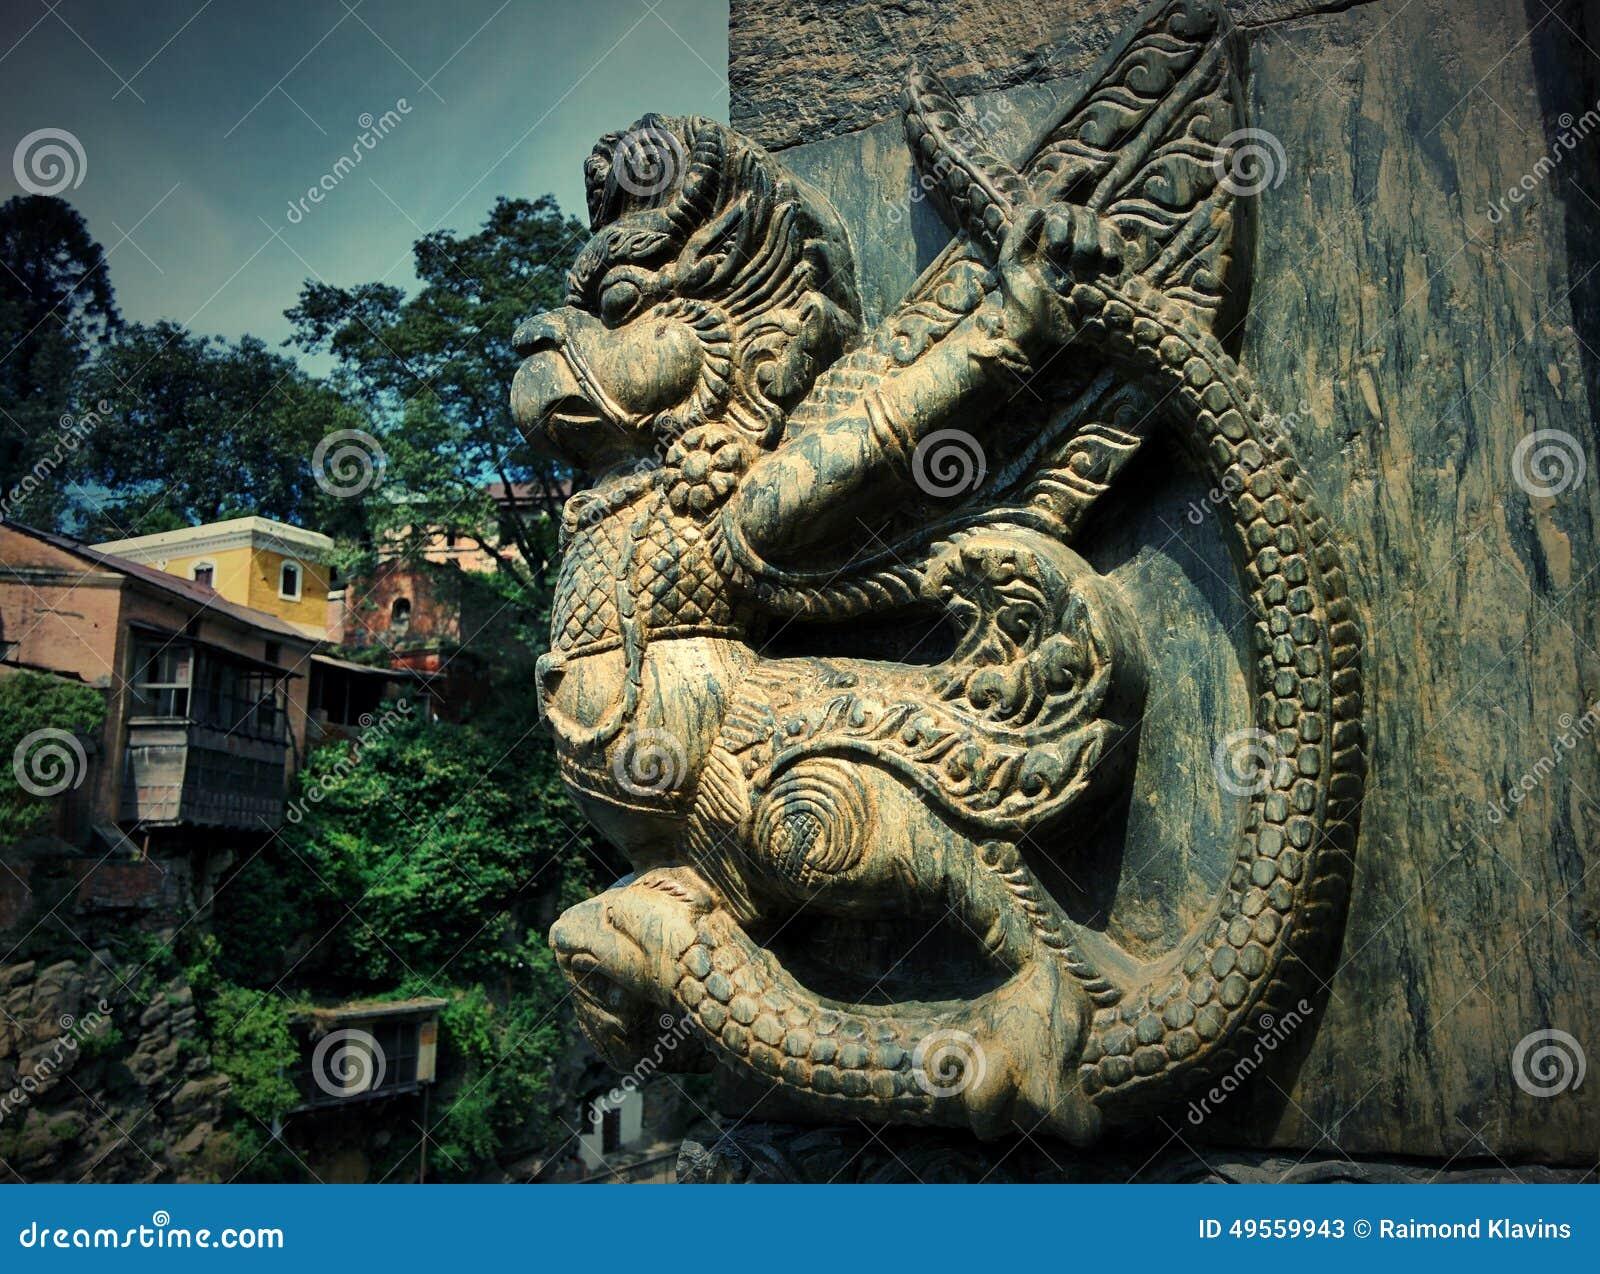 Sculpture Garuda near temple Pashupatinath in Kathmandu